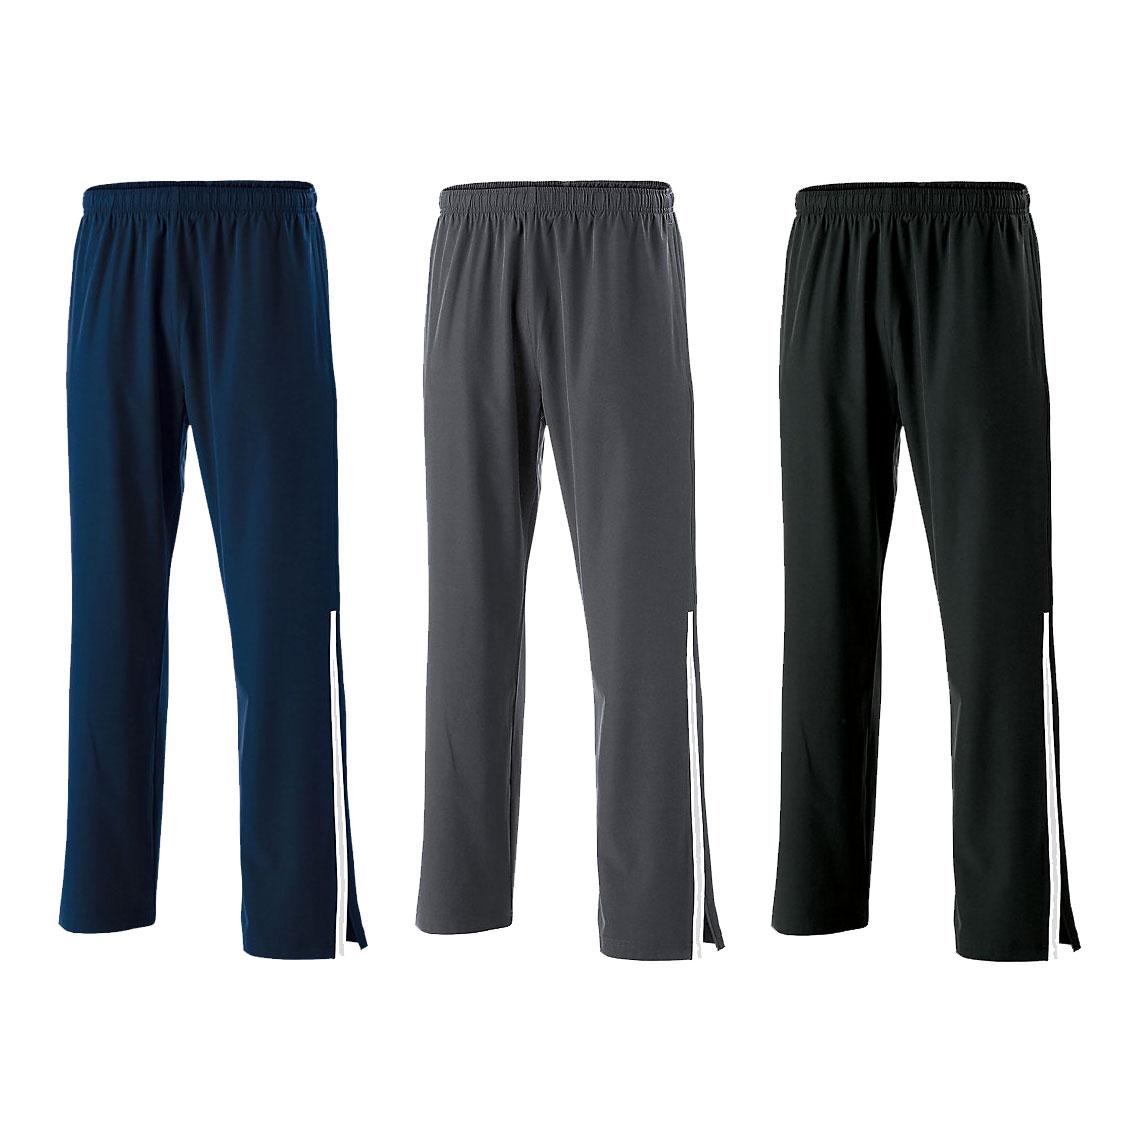 Style 9544 Pants